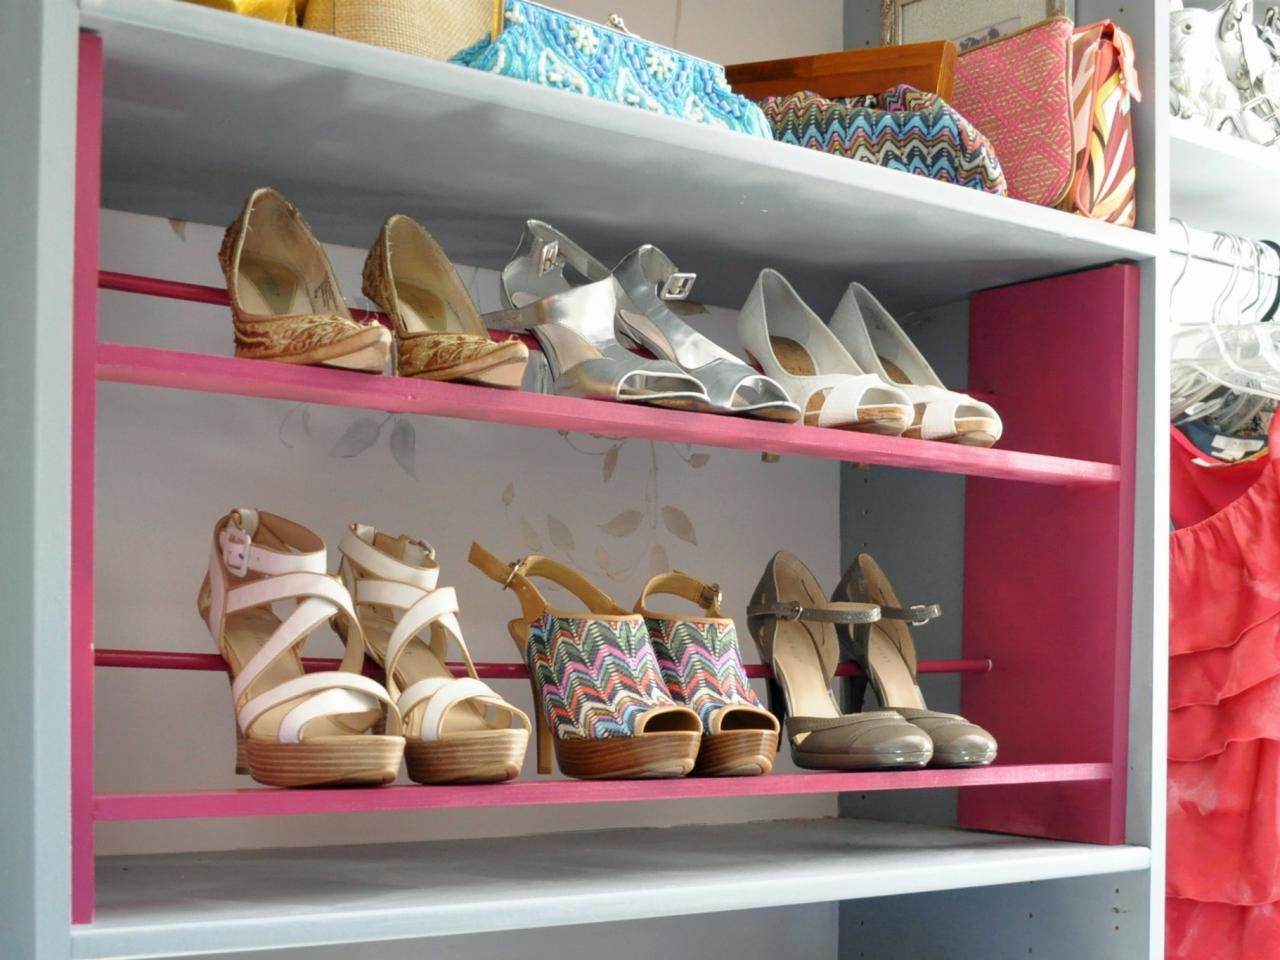 Diy shoe storage ideas httpduwetxyz090056diyshoe